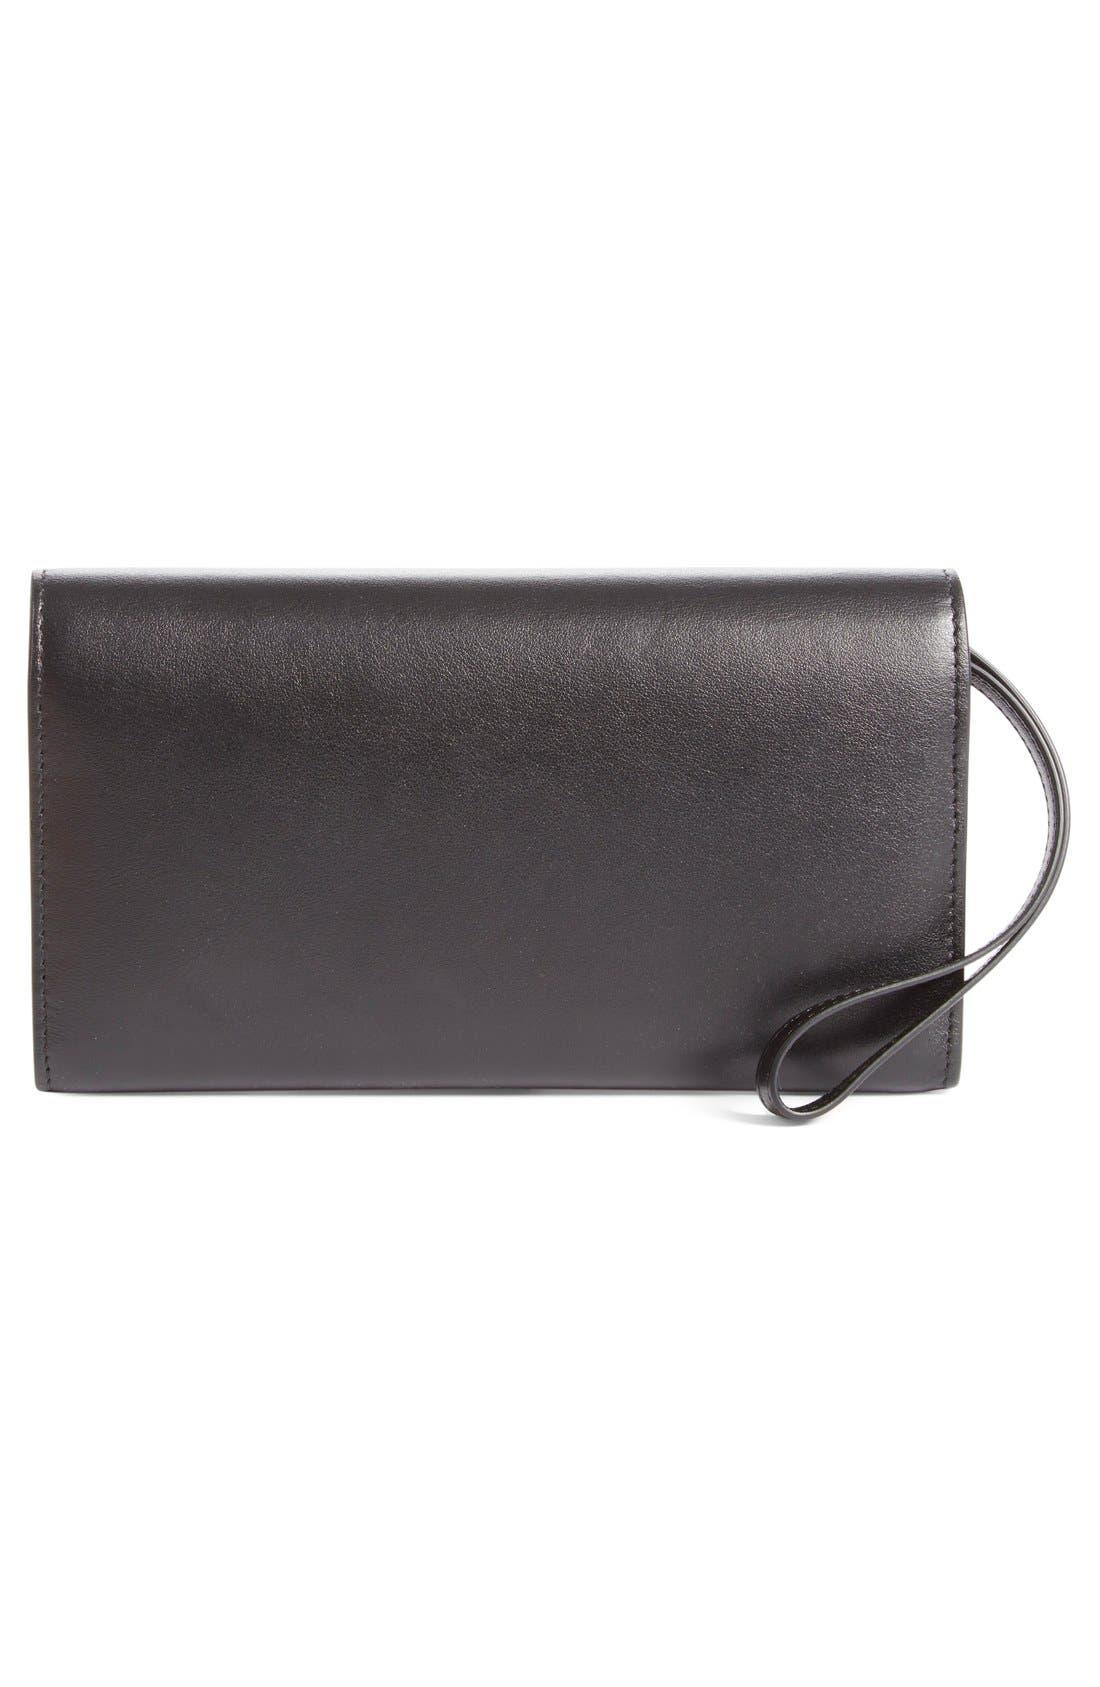 'Macaron' Studded Leather Continental Wallet,                             Alternate thumbnail 3, color,                             Black/ Gunmetal